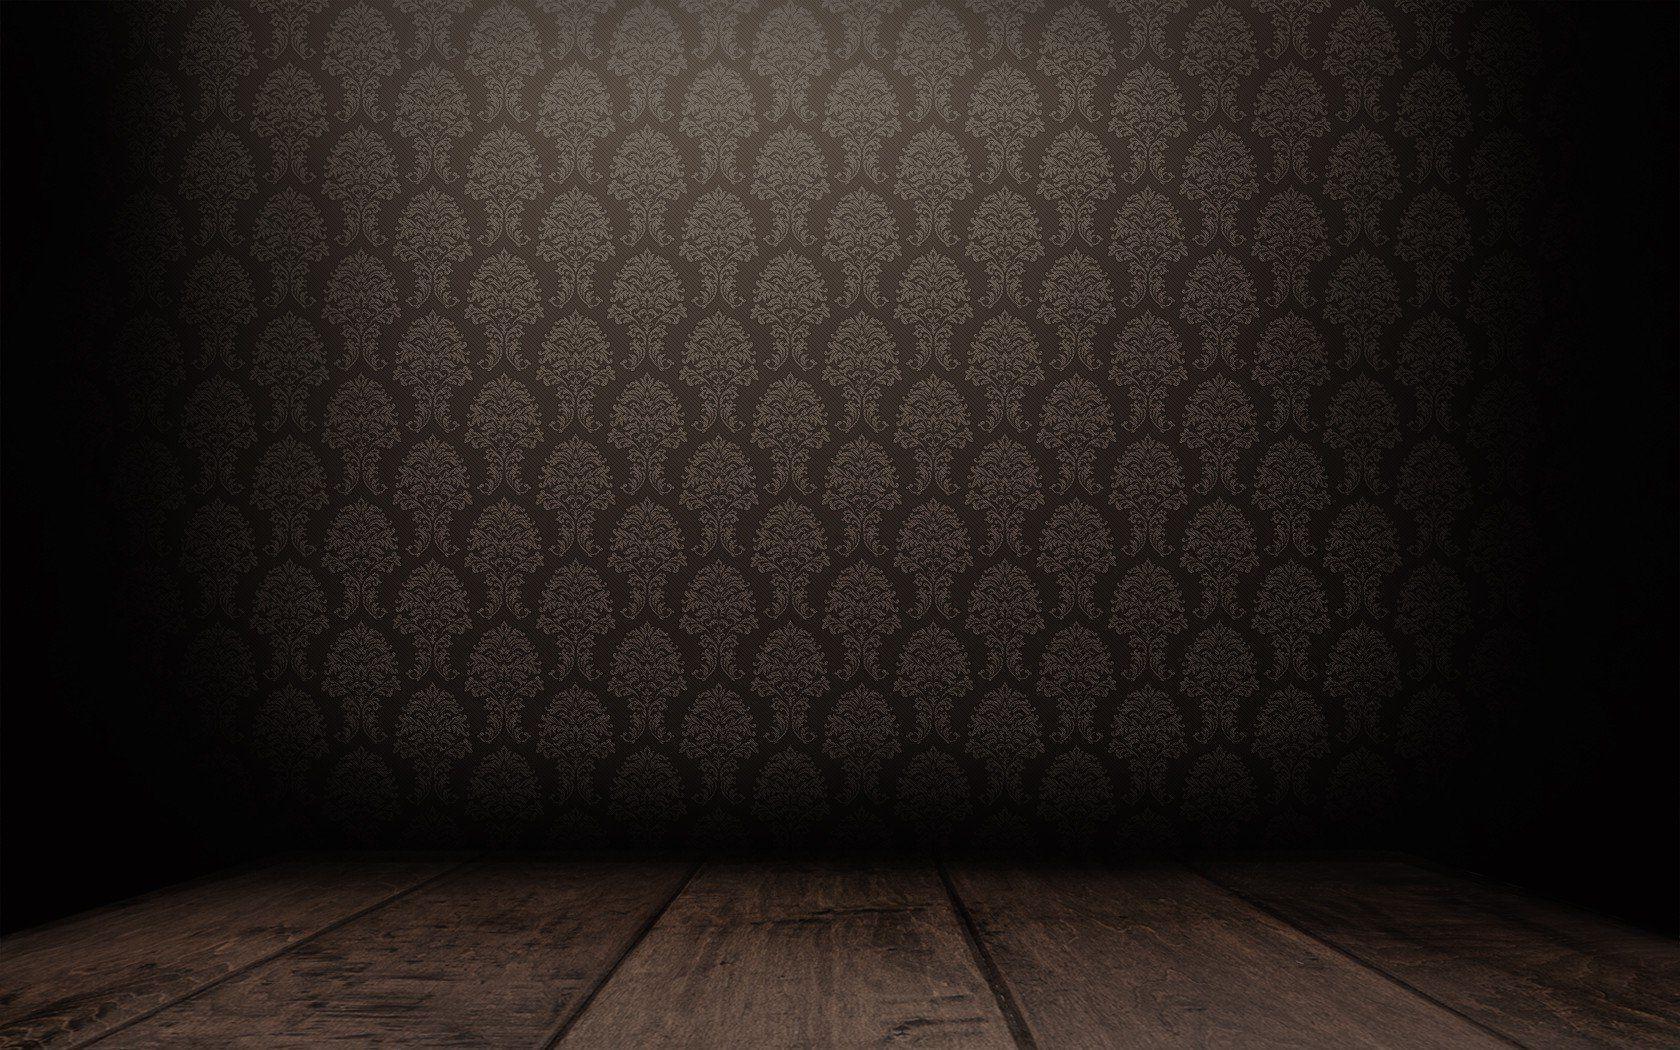 Dark Room: Dark Room Wallpapers